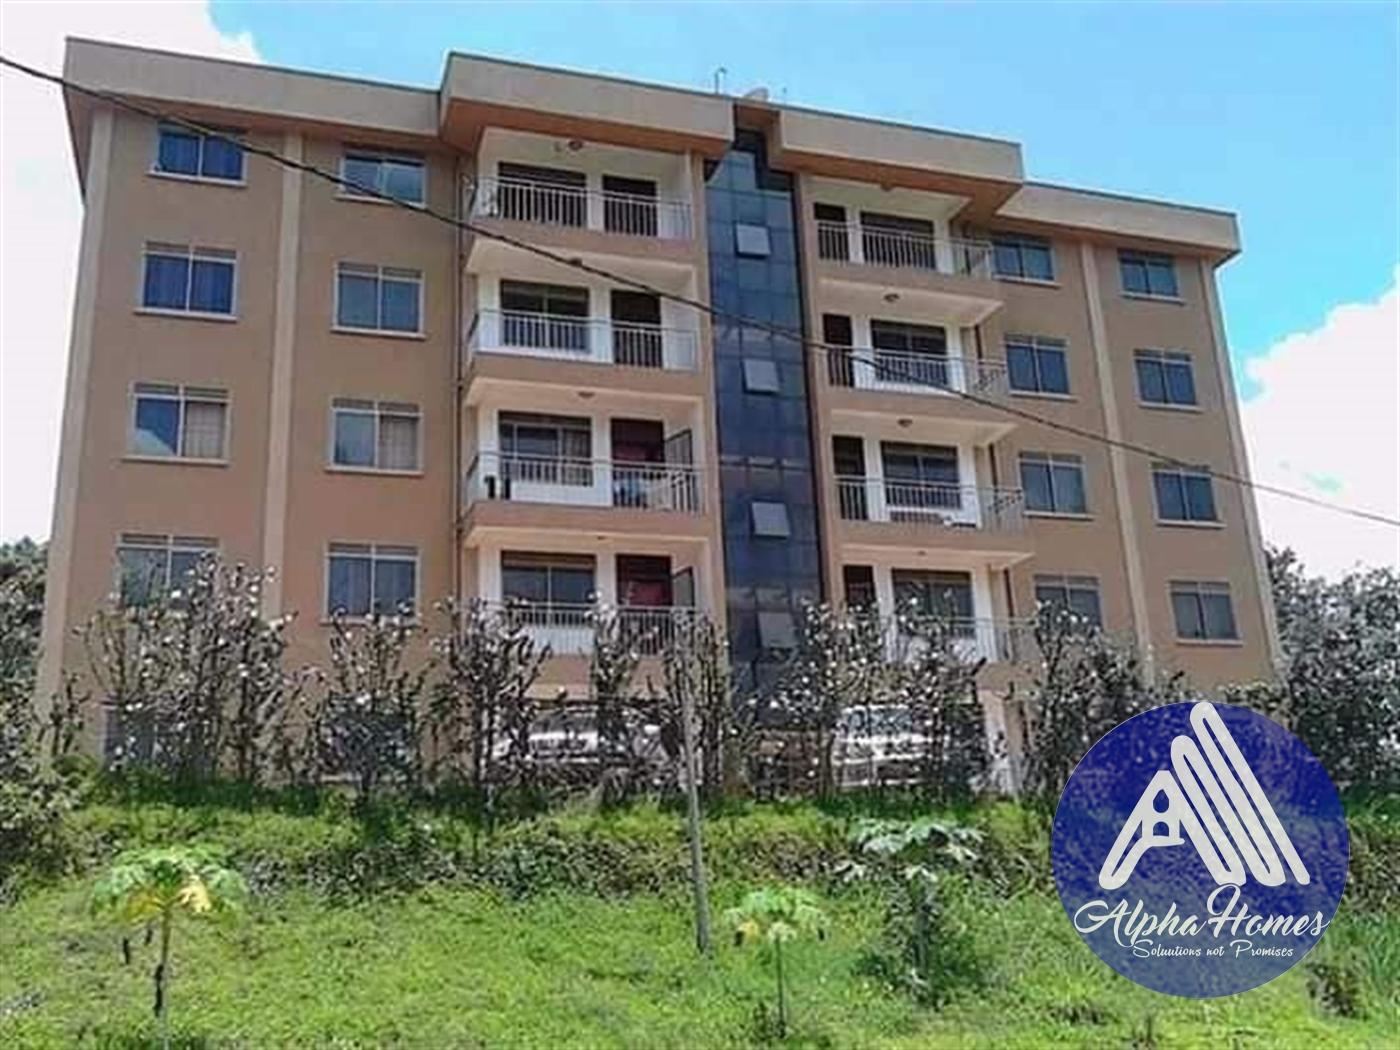 Apartment for rent in Bukoto Kampala